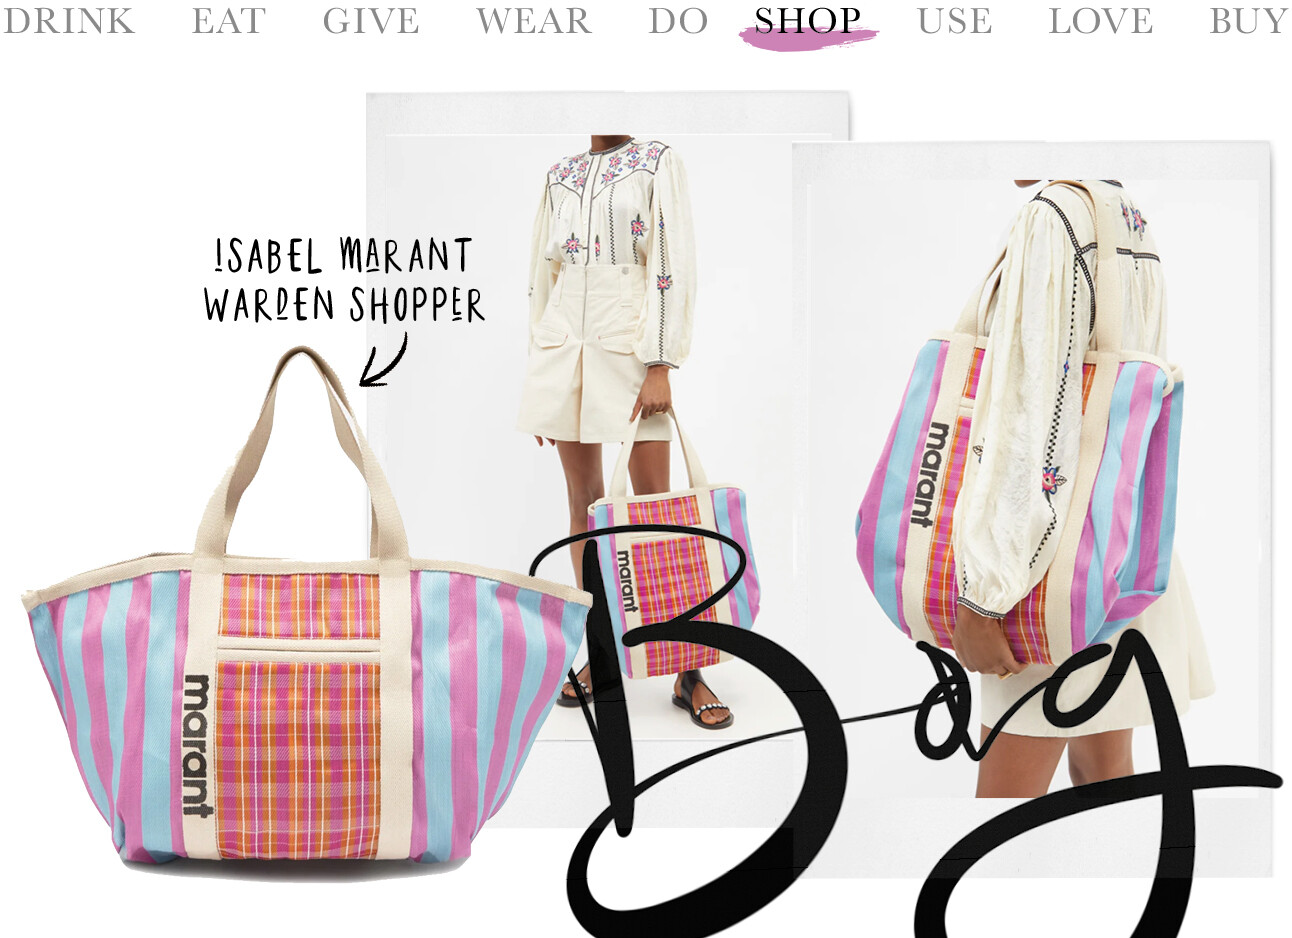 Today we shop: Isabel Marant Warden shopper